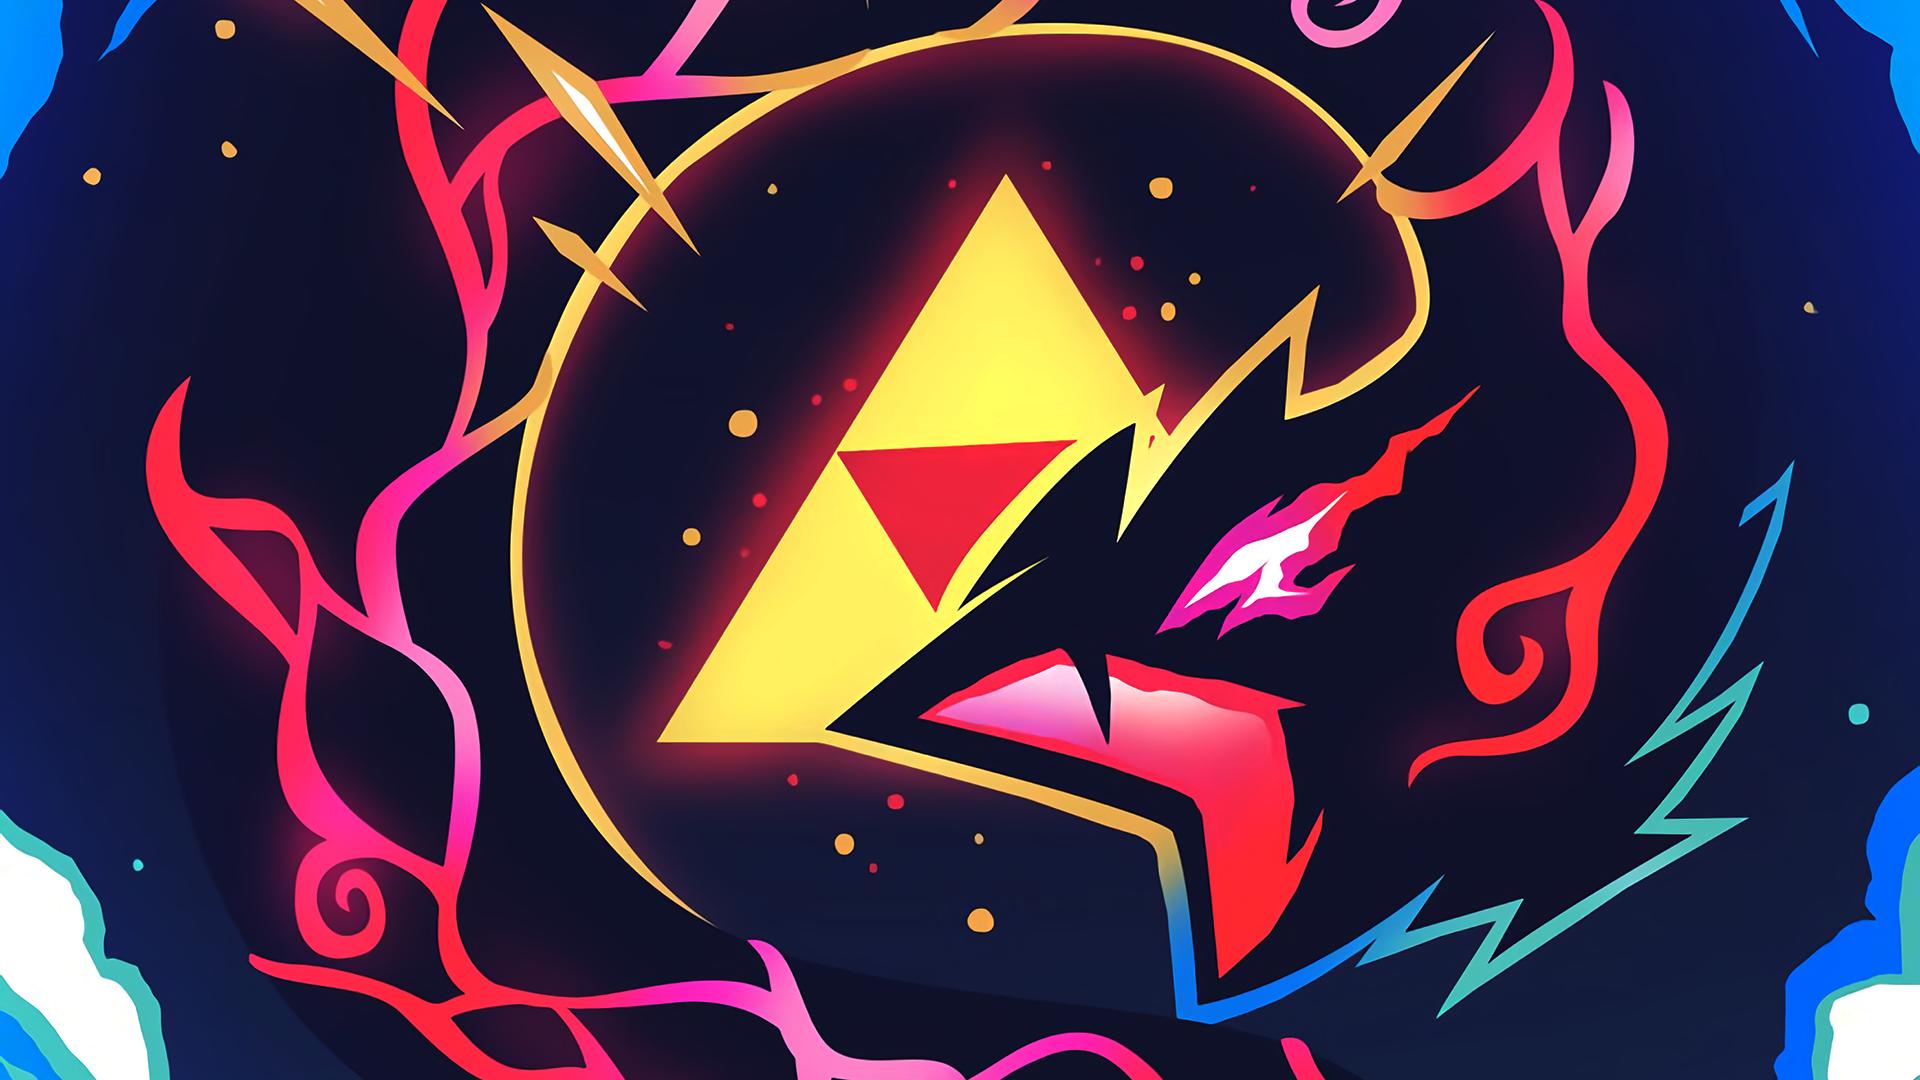 General 1920x1080 digital art dragon triangle colorful Triforce The Legend of Zelda